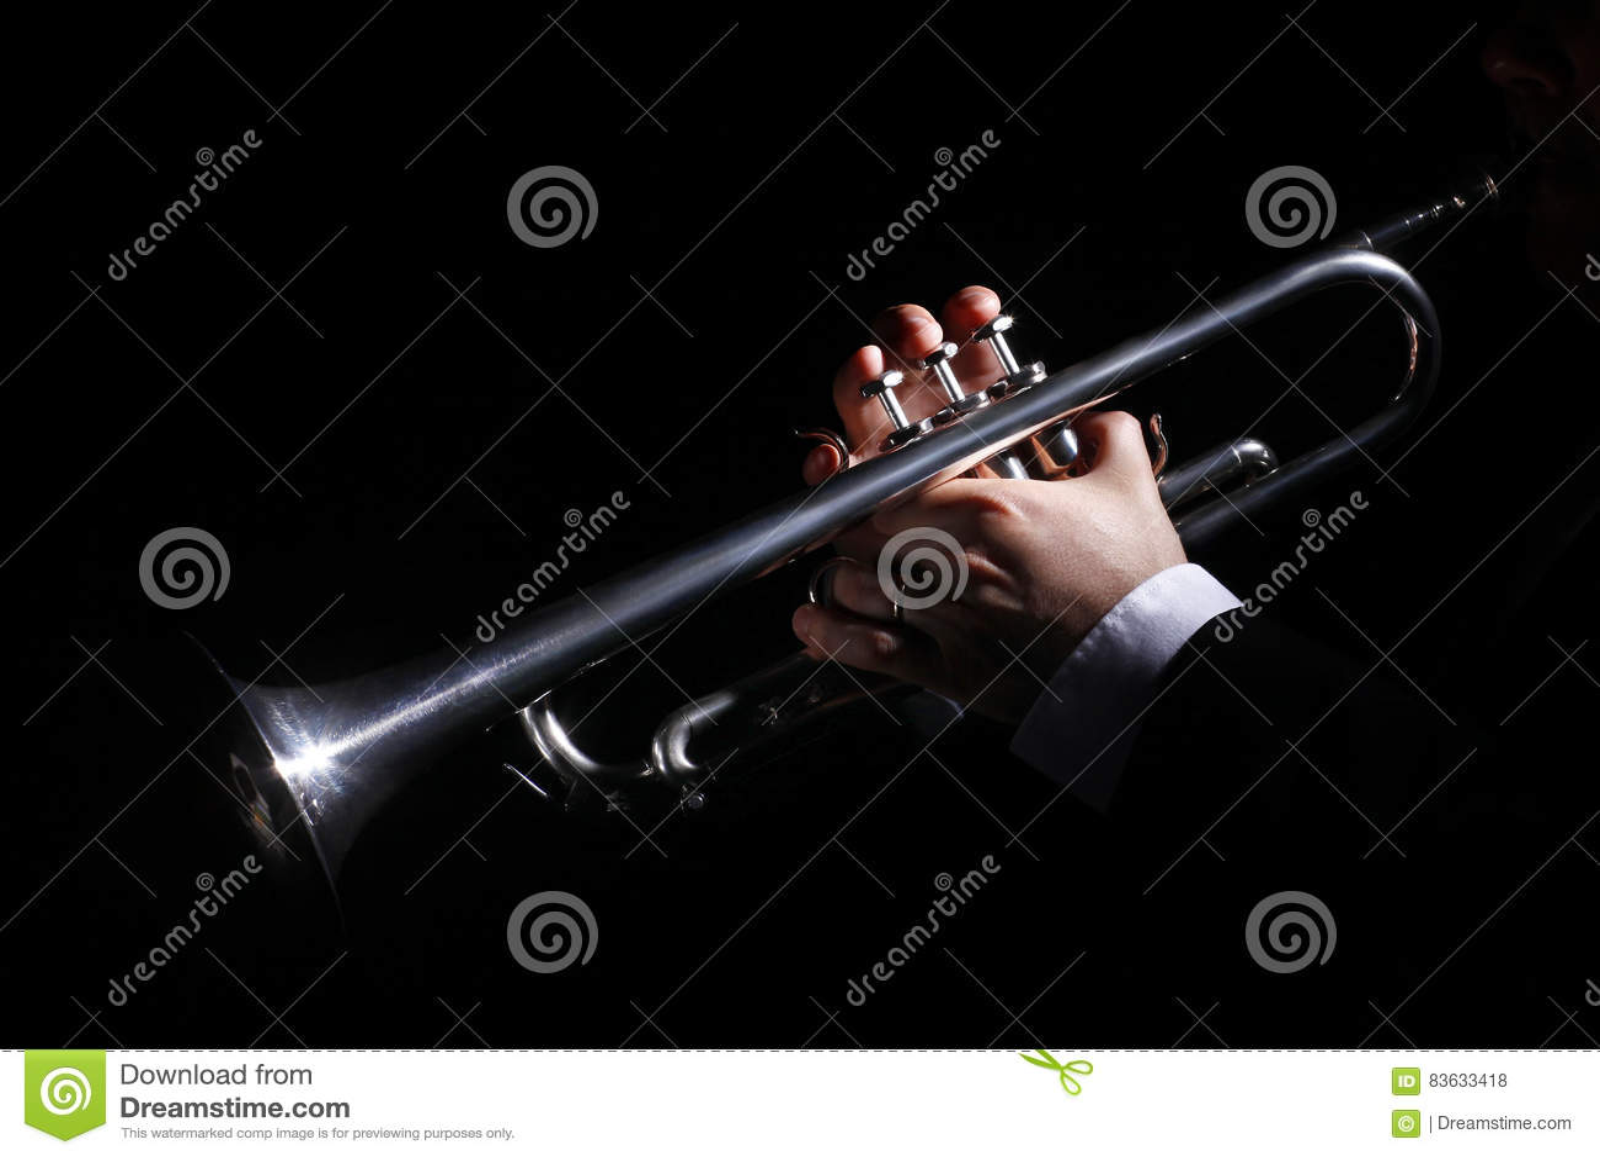 Fireplace, trumpet, music